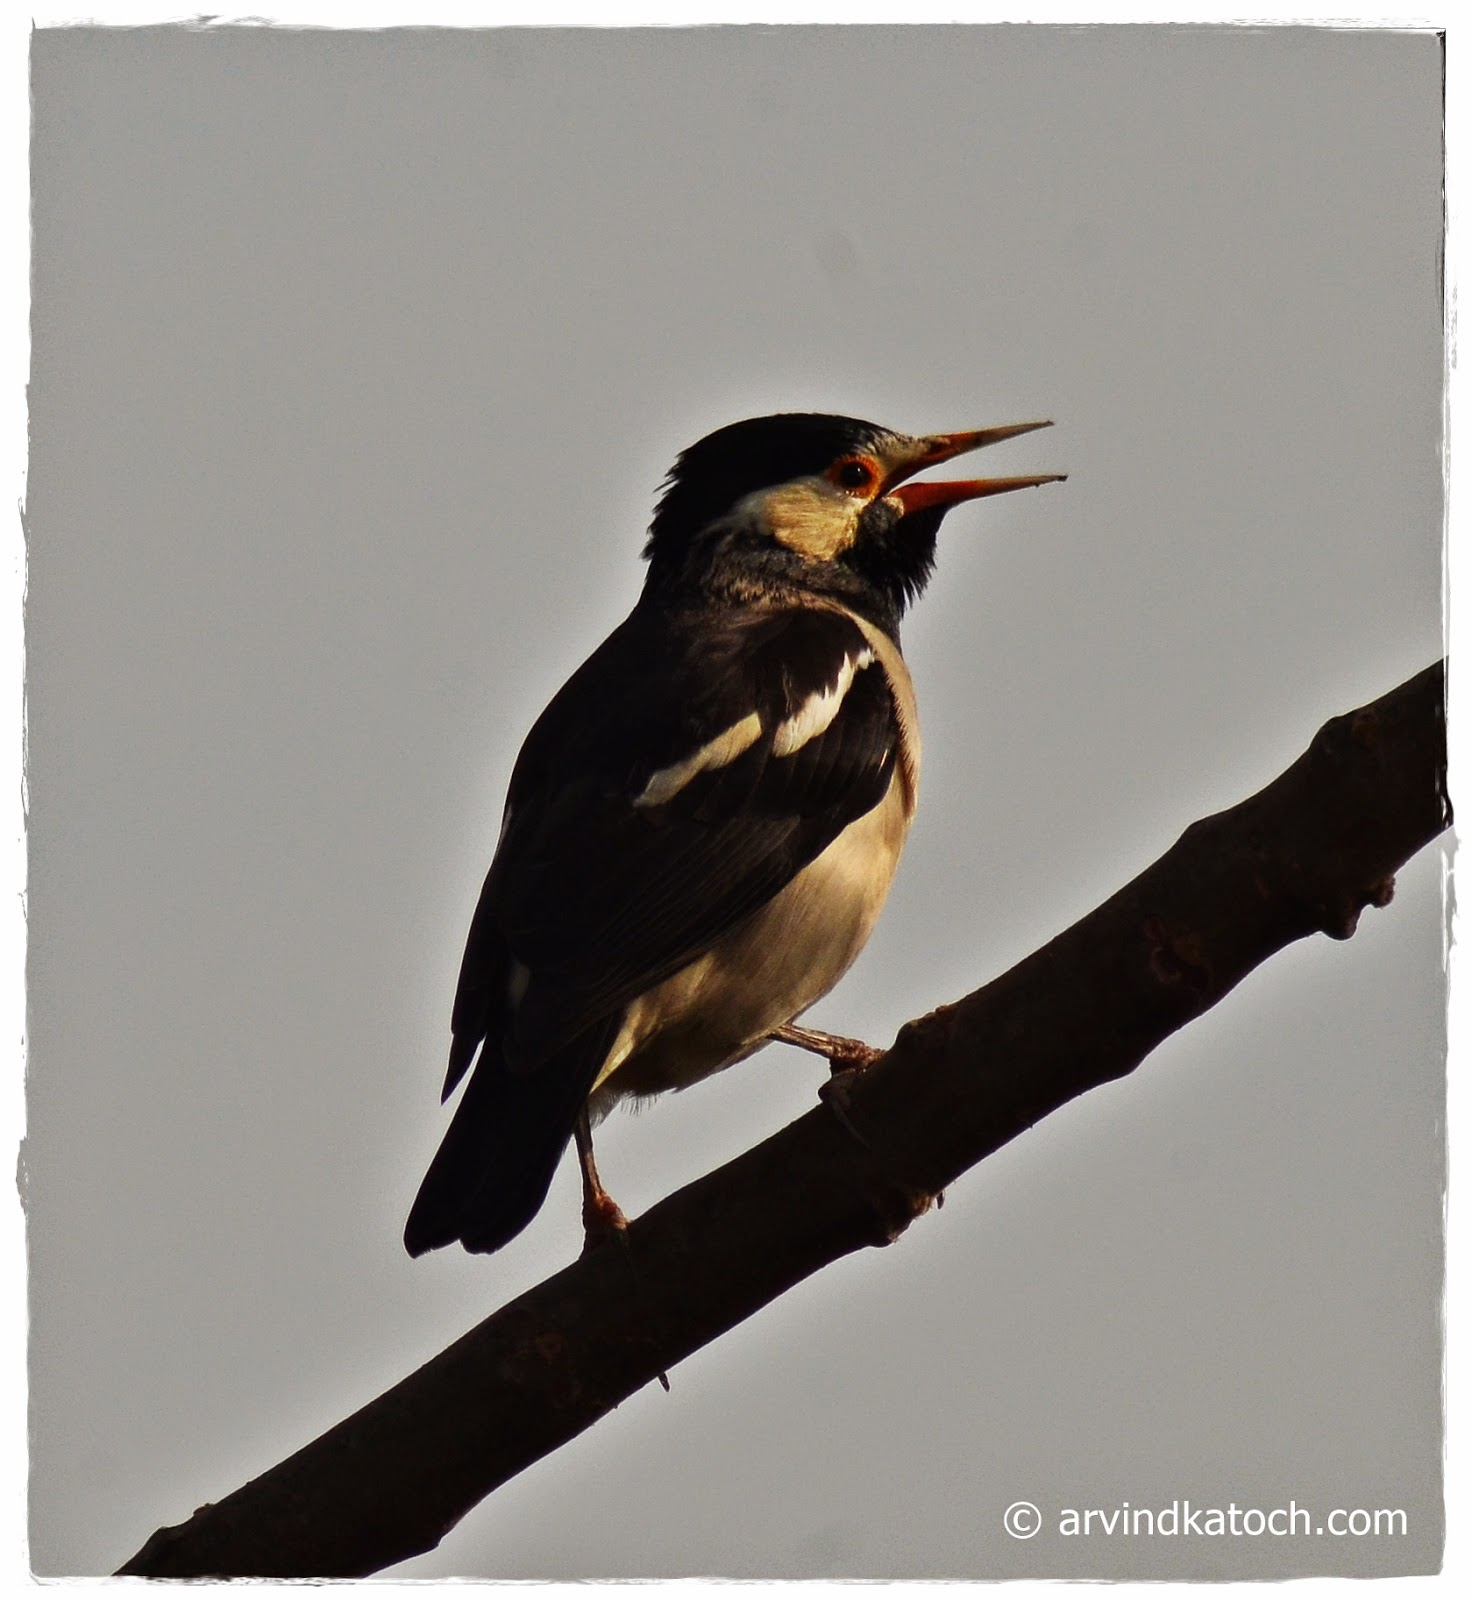 Pied Myna, Asian Pied startling, Myna, Bird, Punjab